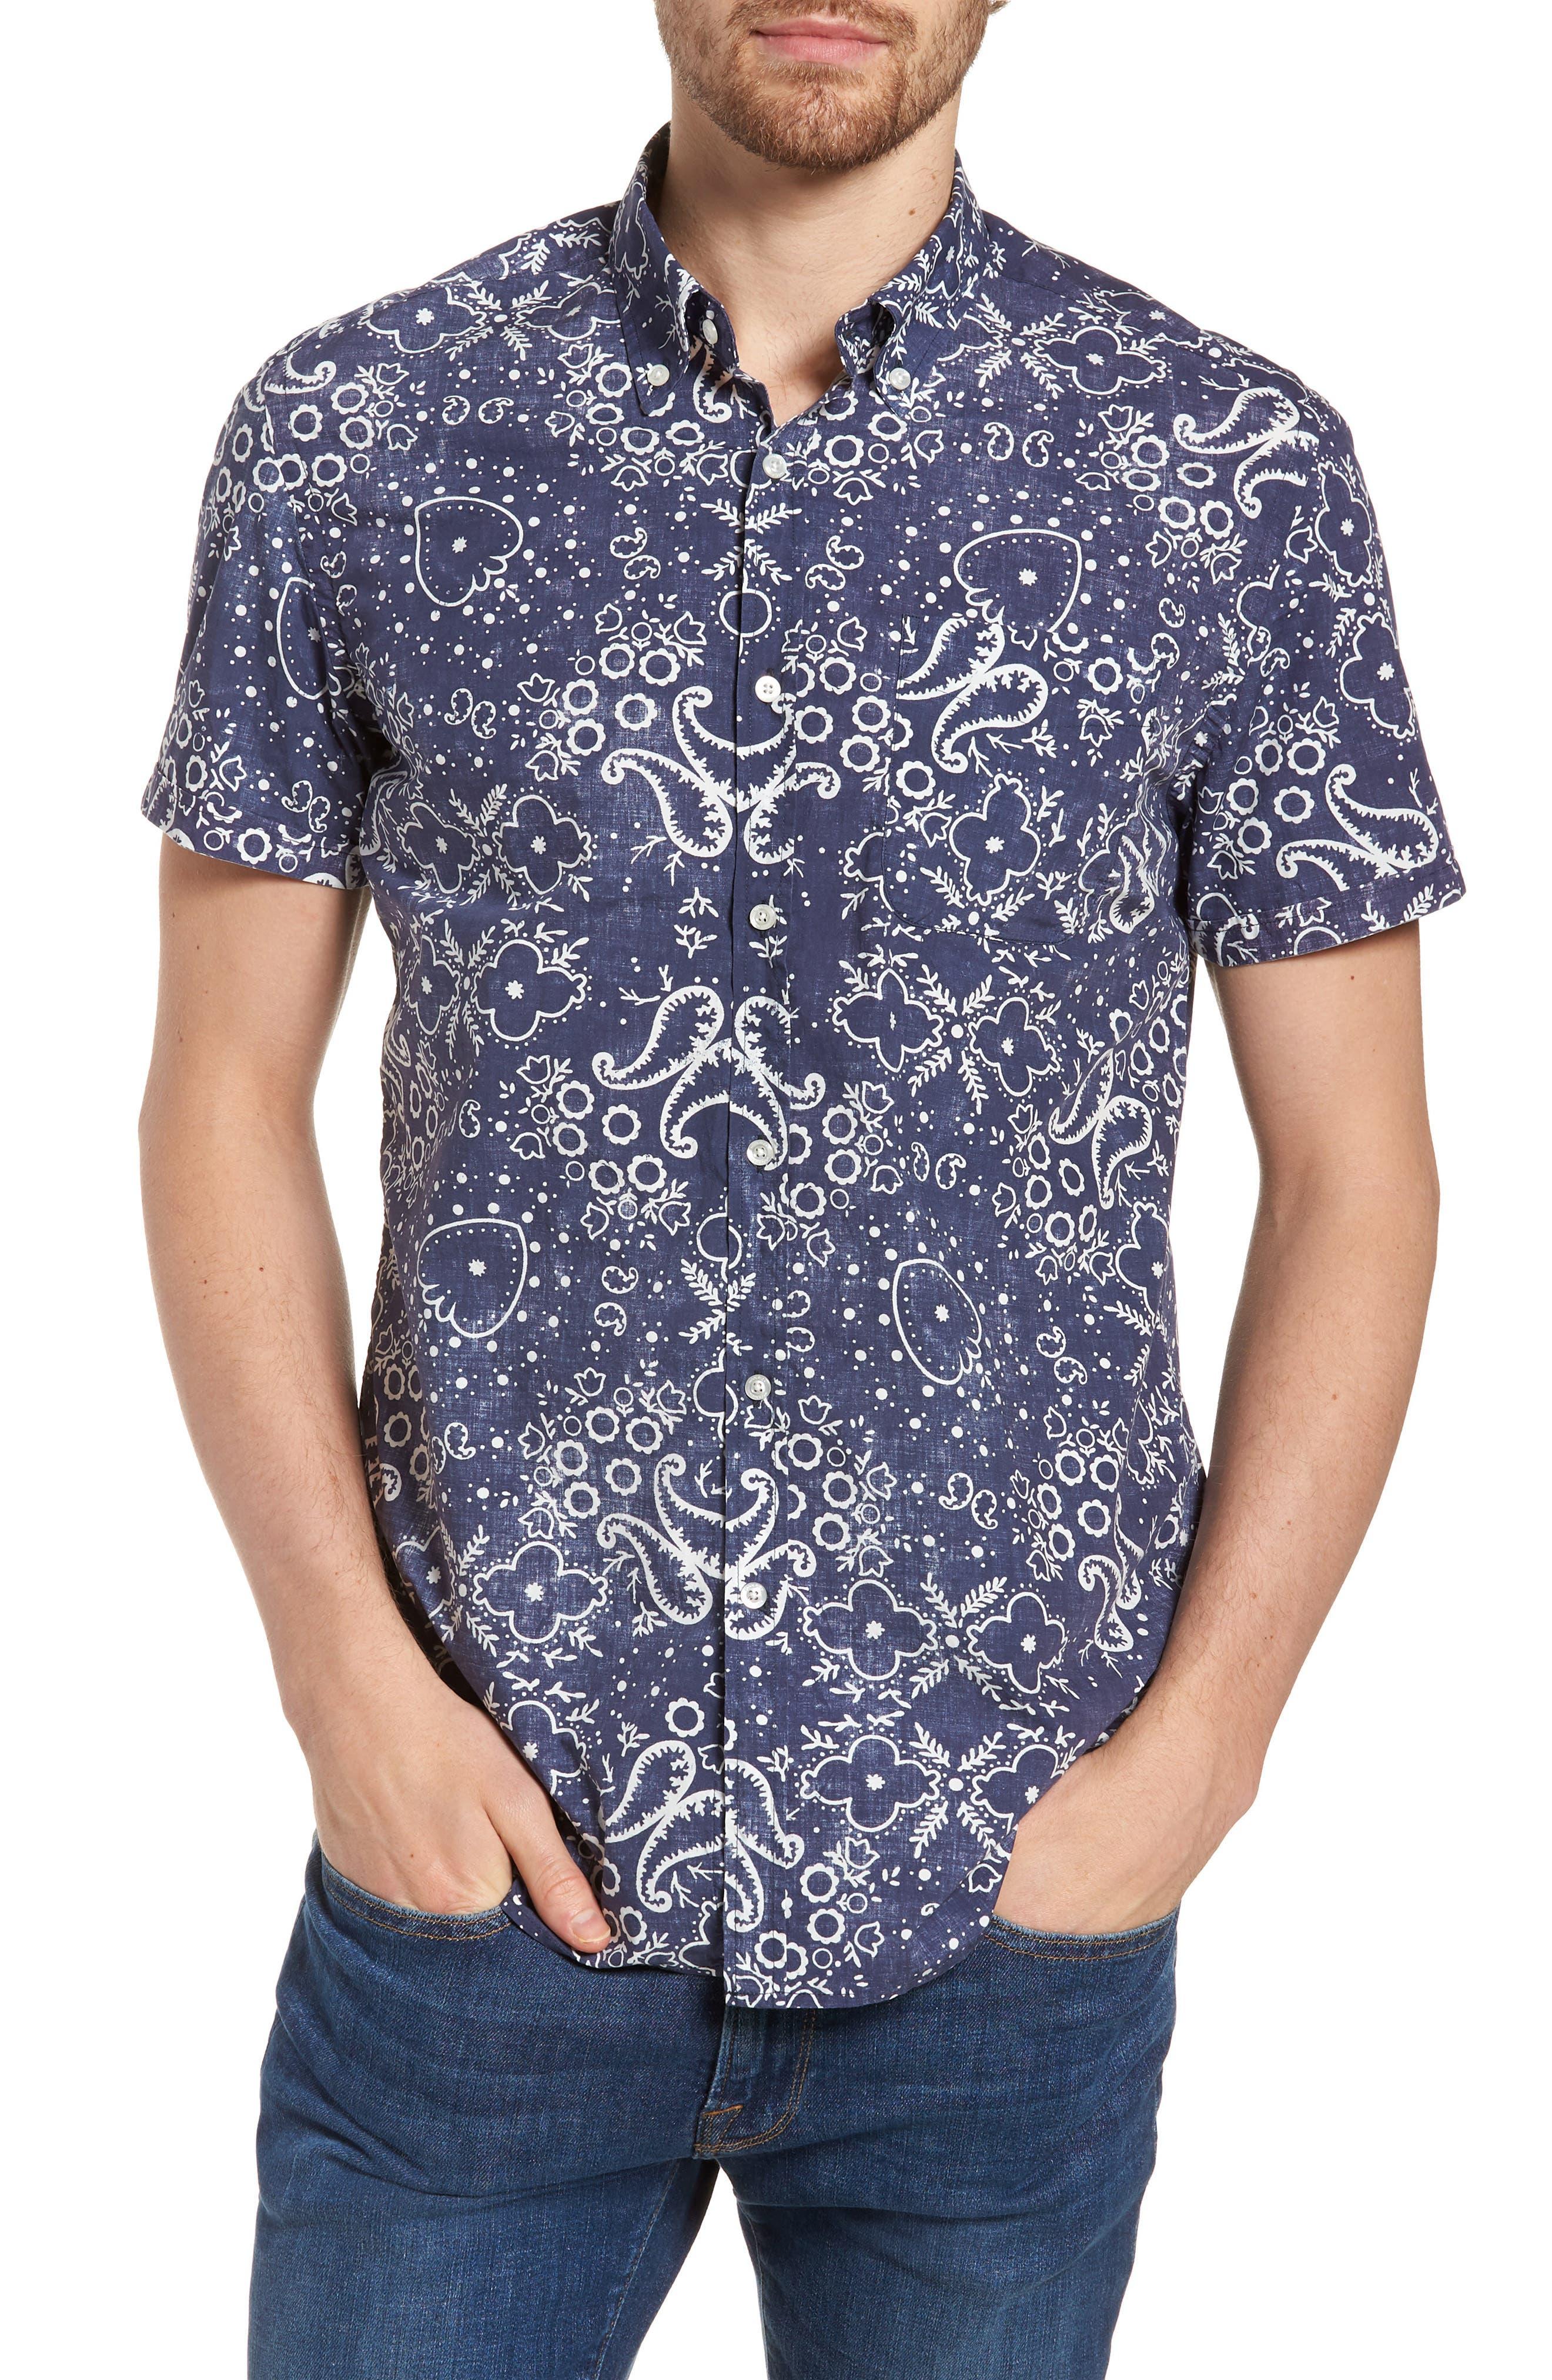 & Bros. Paisley Sport Shirt,                         Main,                         color, ALPINE NAVY